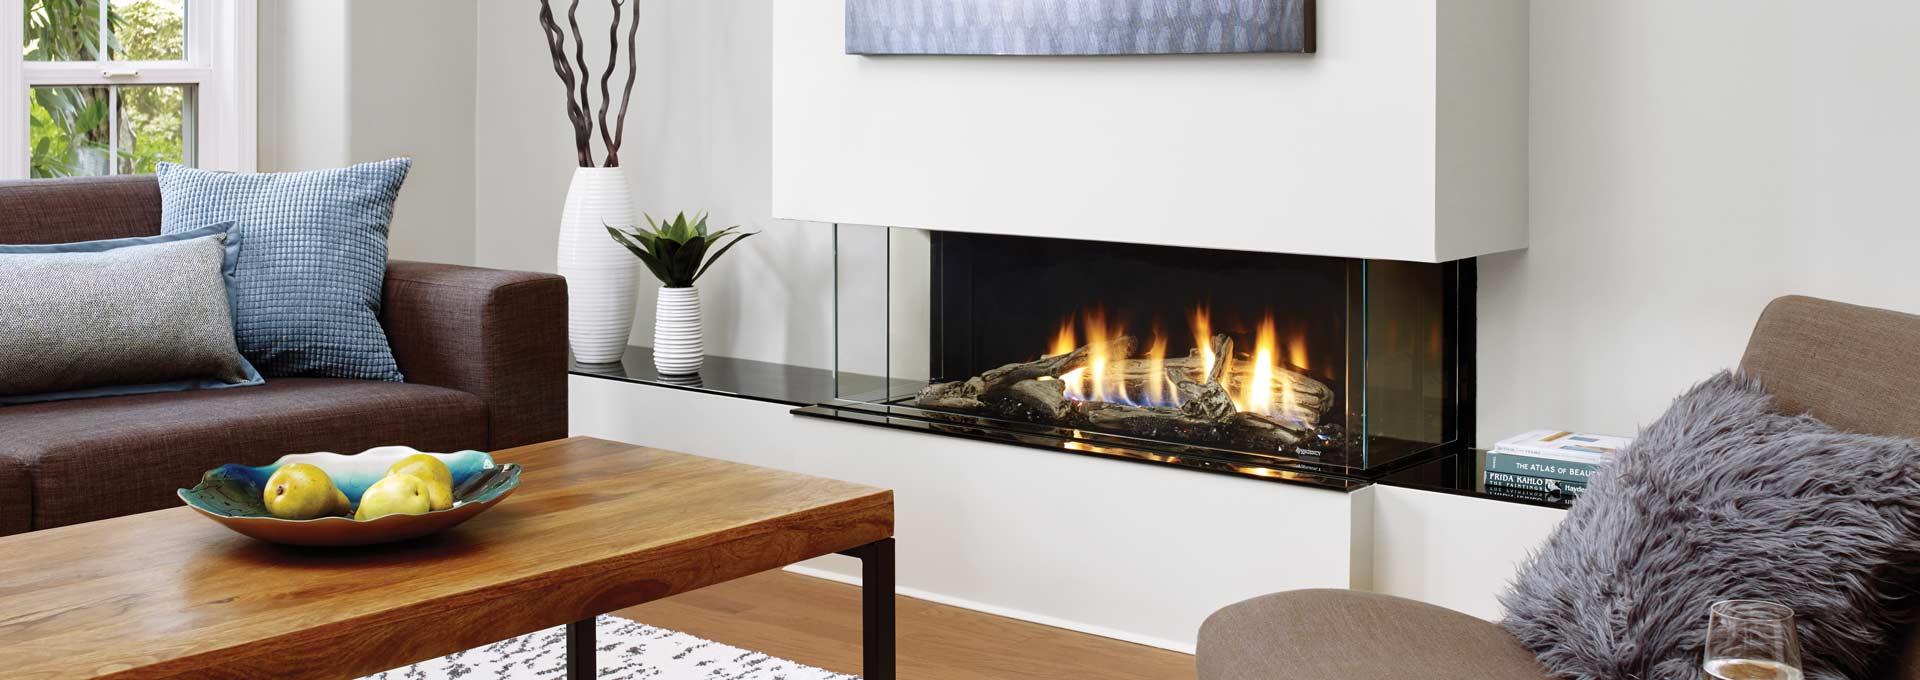 Regency City Series San Francisco Bay 60 Gas Fireplace